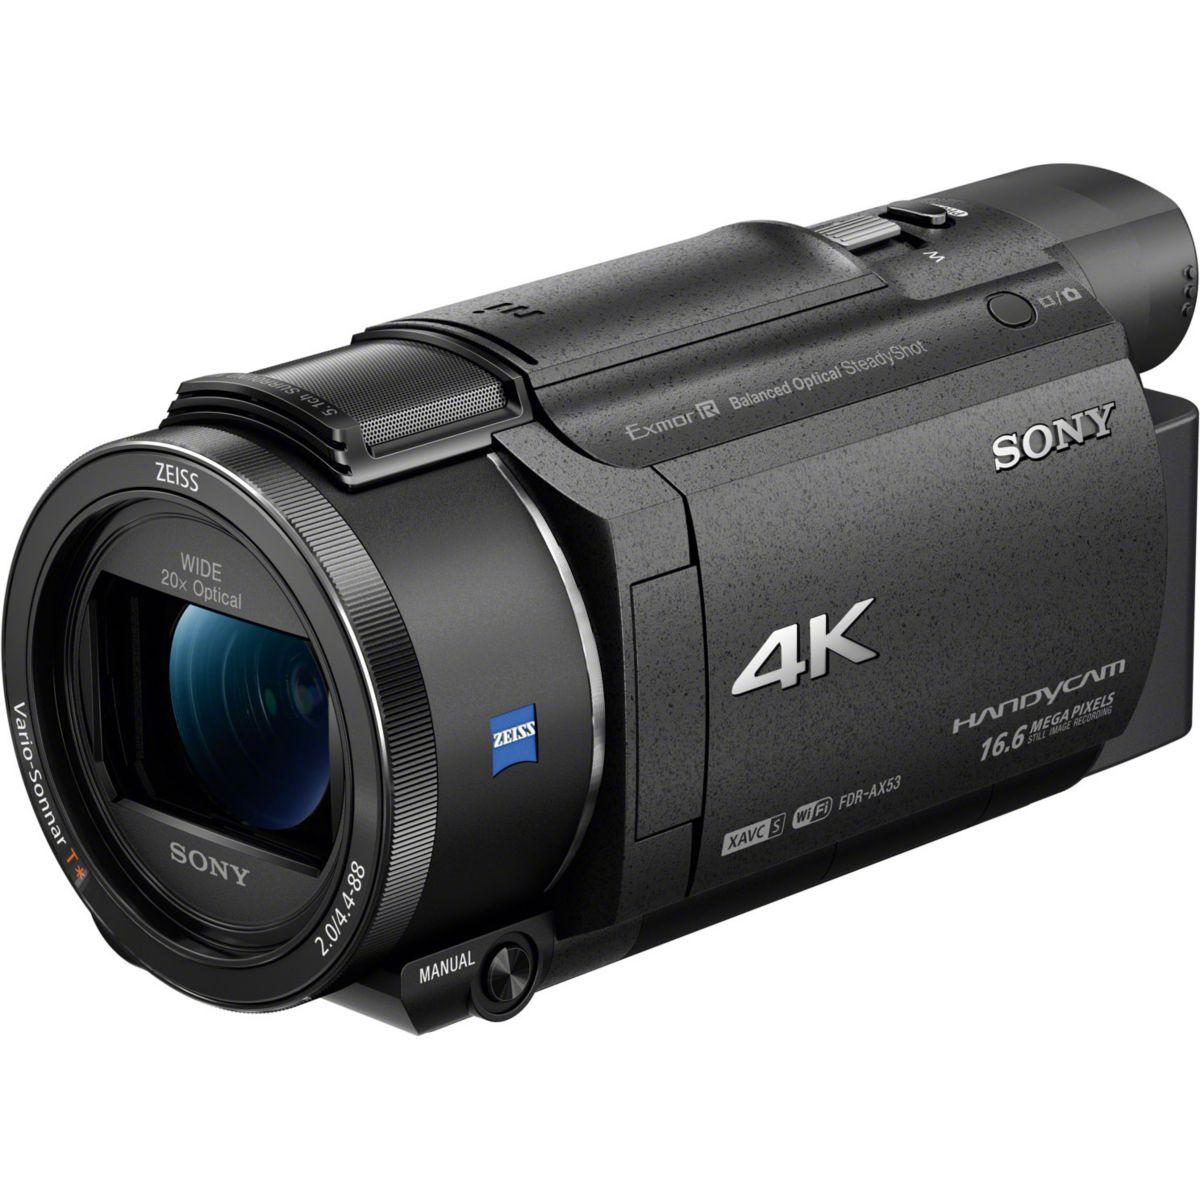 Camescope SONY FDR-AX53